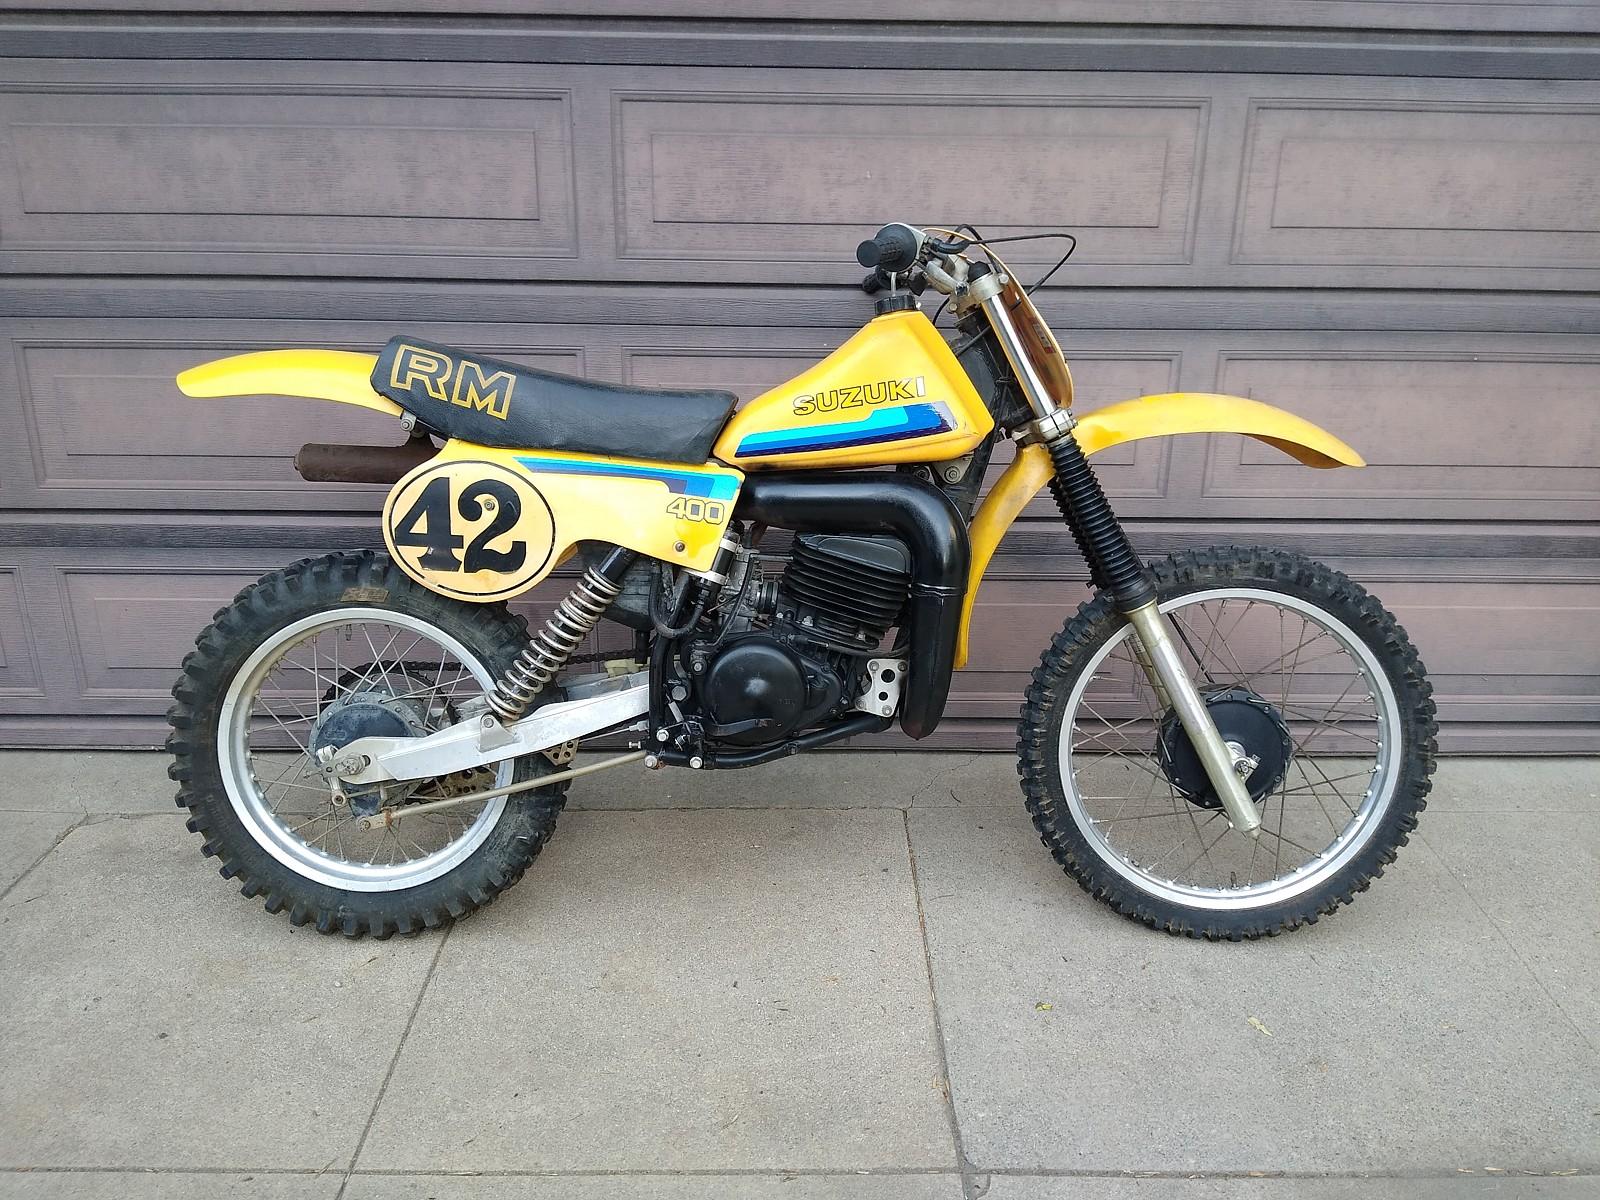 my-1980-RM400 (1) - CZ28x - Motocross Pictures - Vital MX